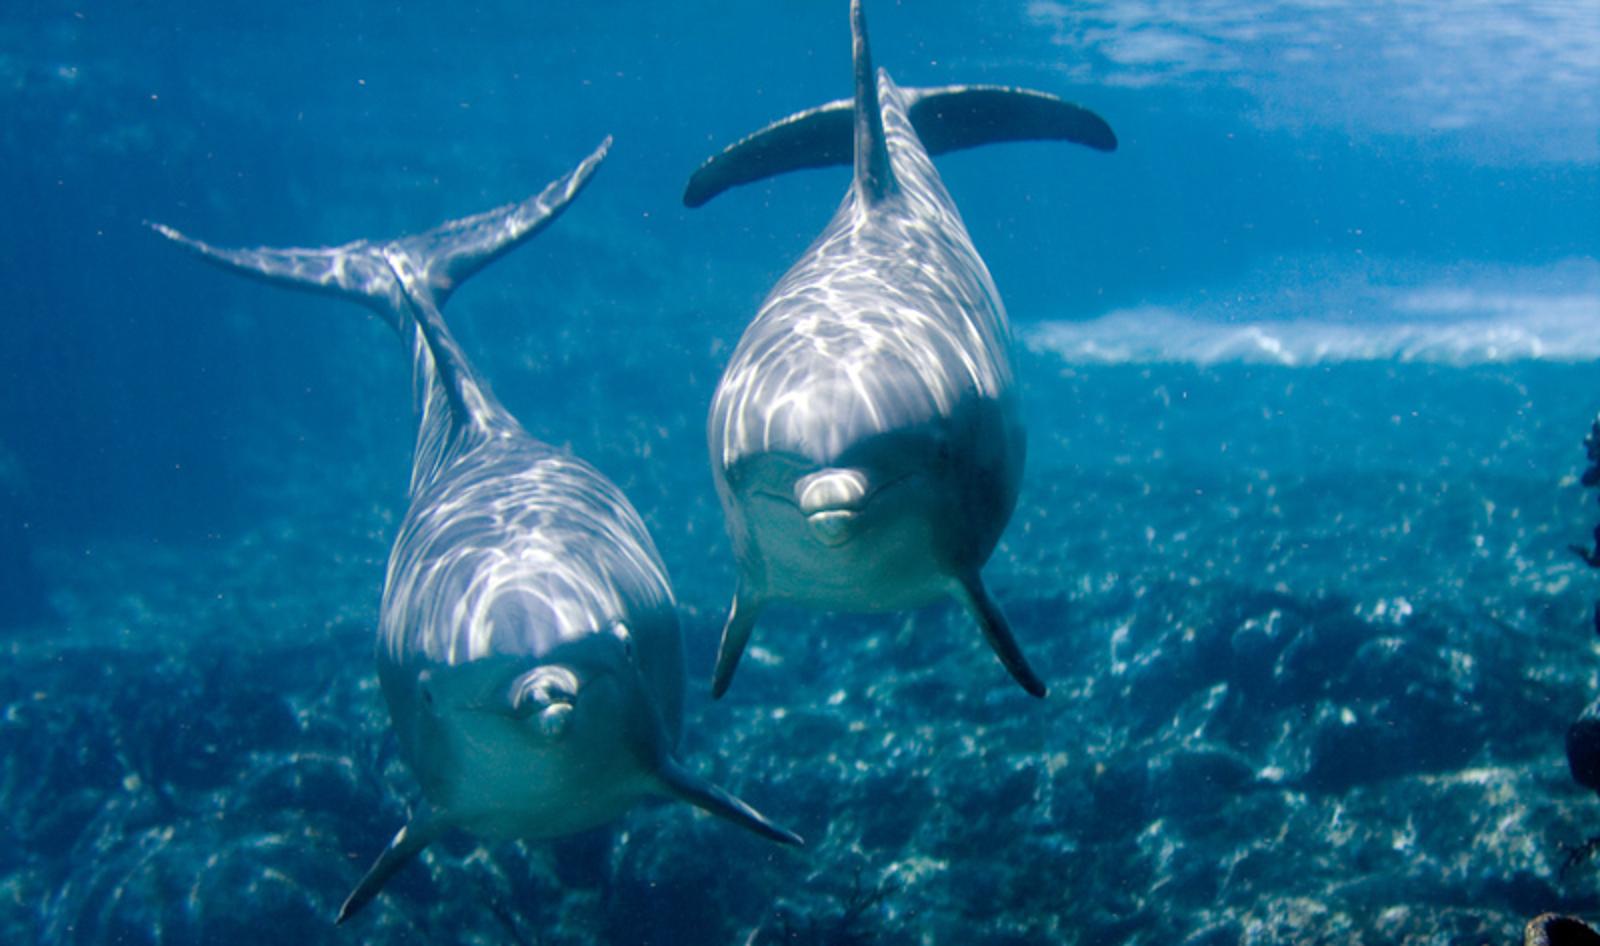 7 Things SeaWorld's Newborn Dolphin Calf May Never Experience